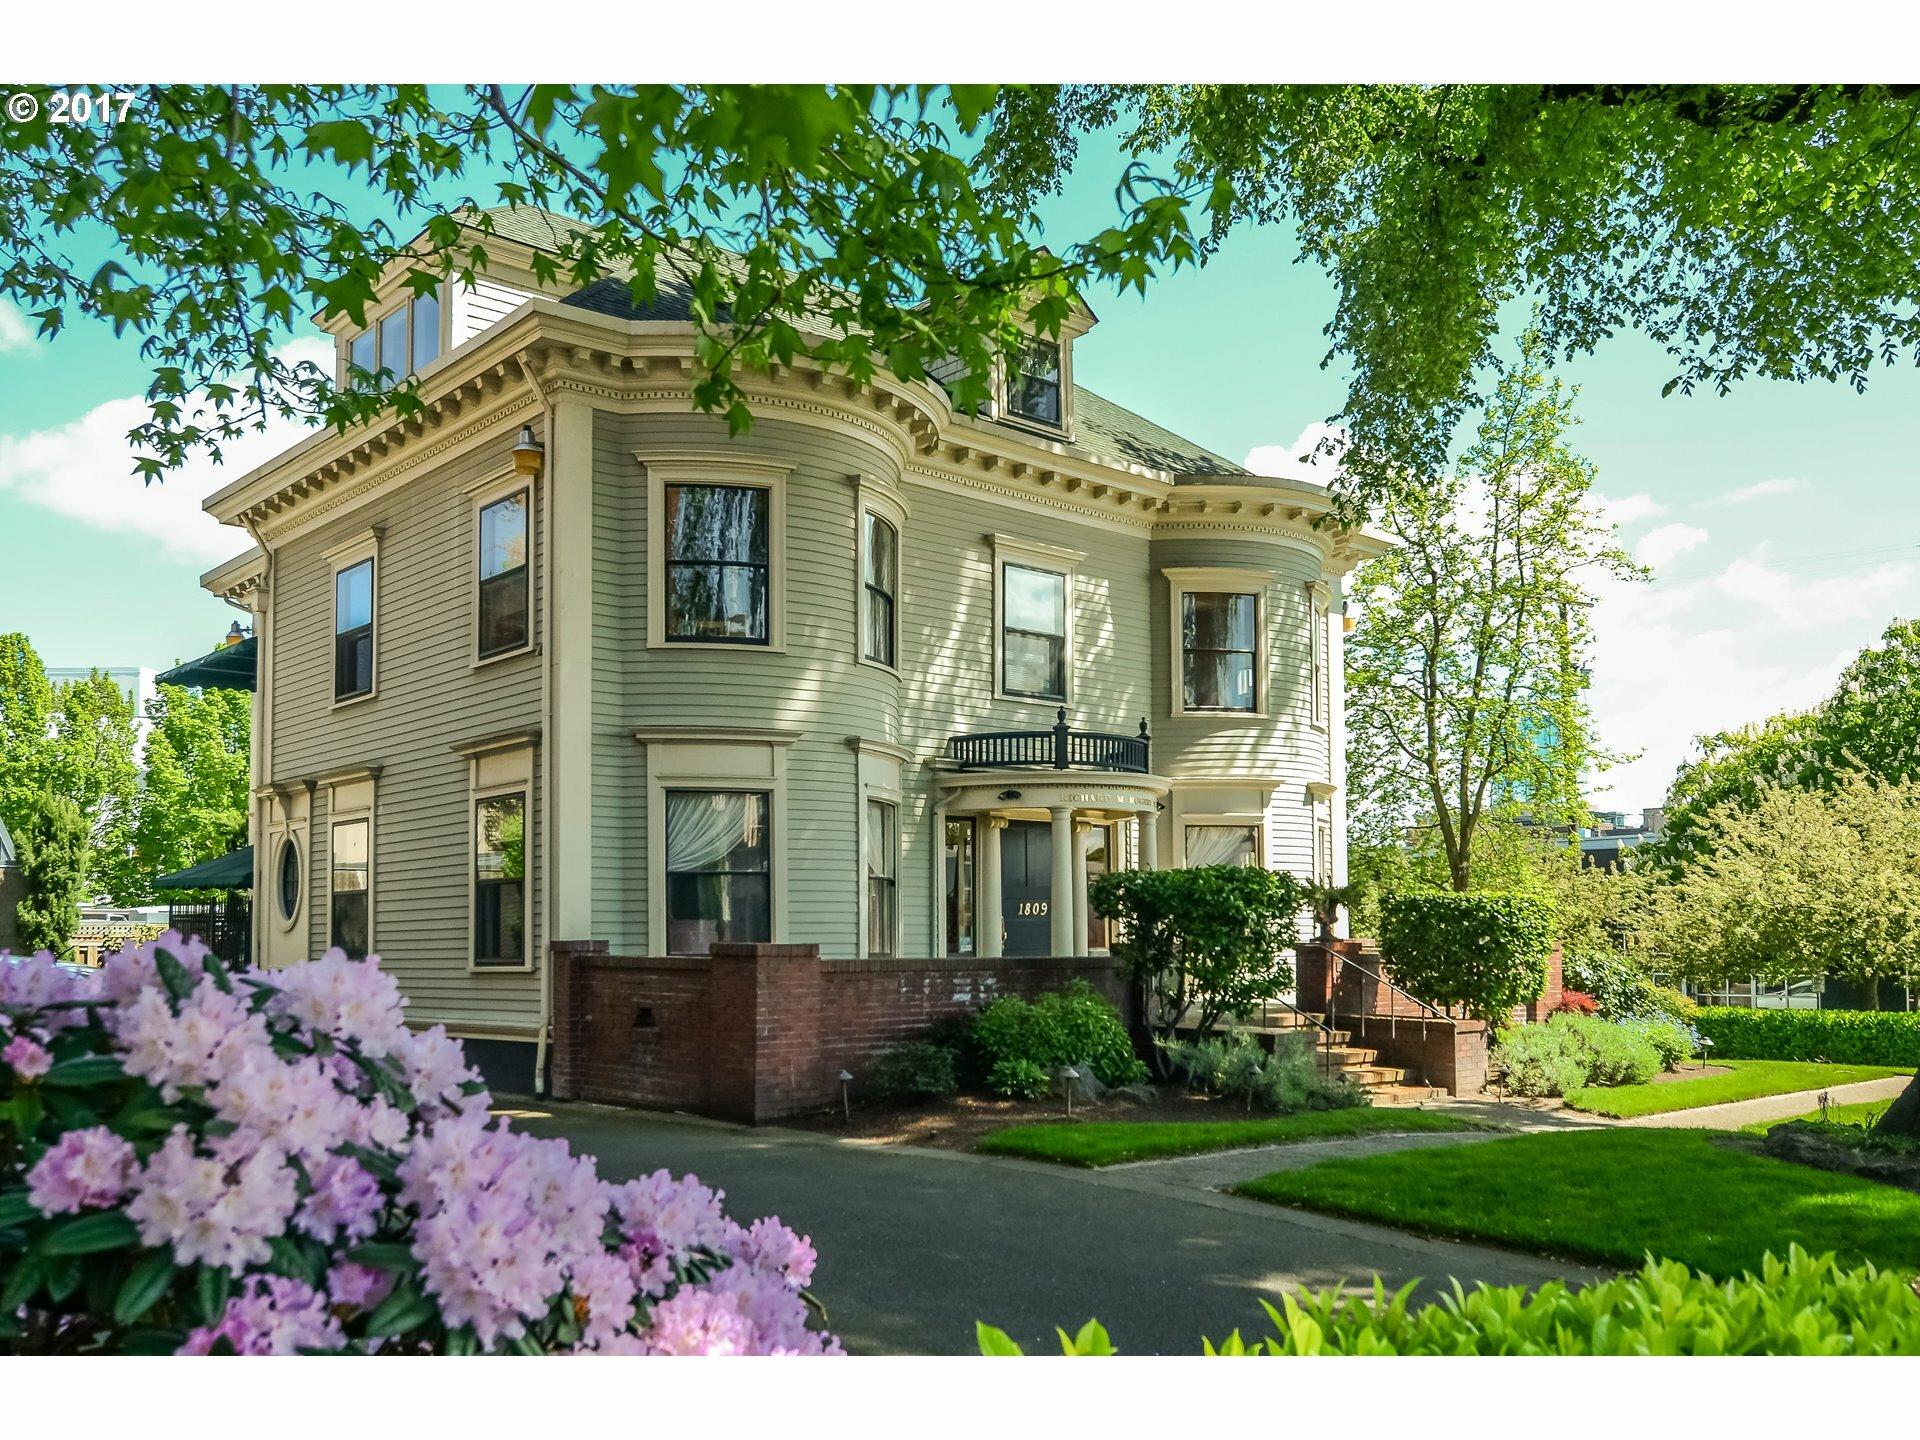 1809 Nw Johnson St, Portland, OR - USA (photo 1)